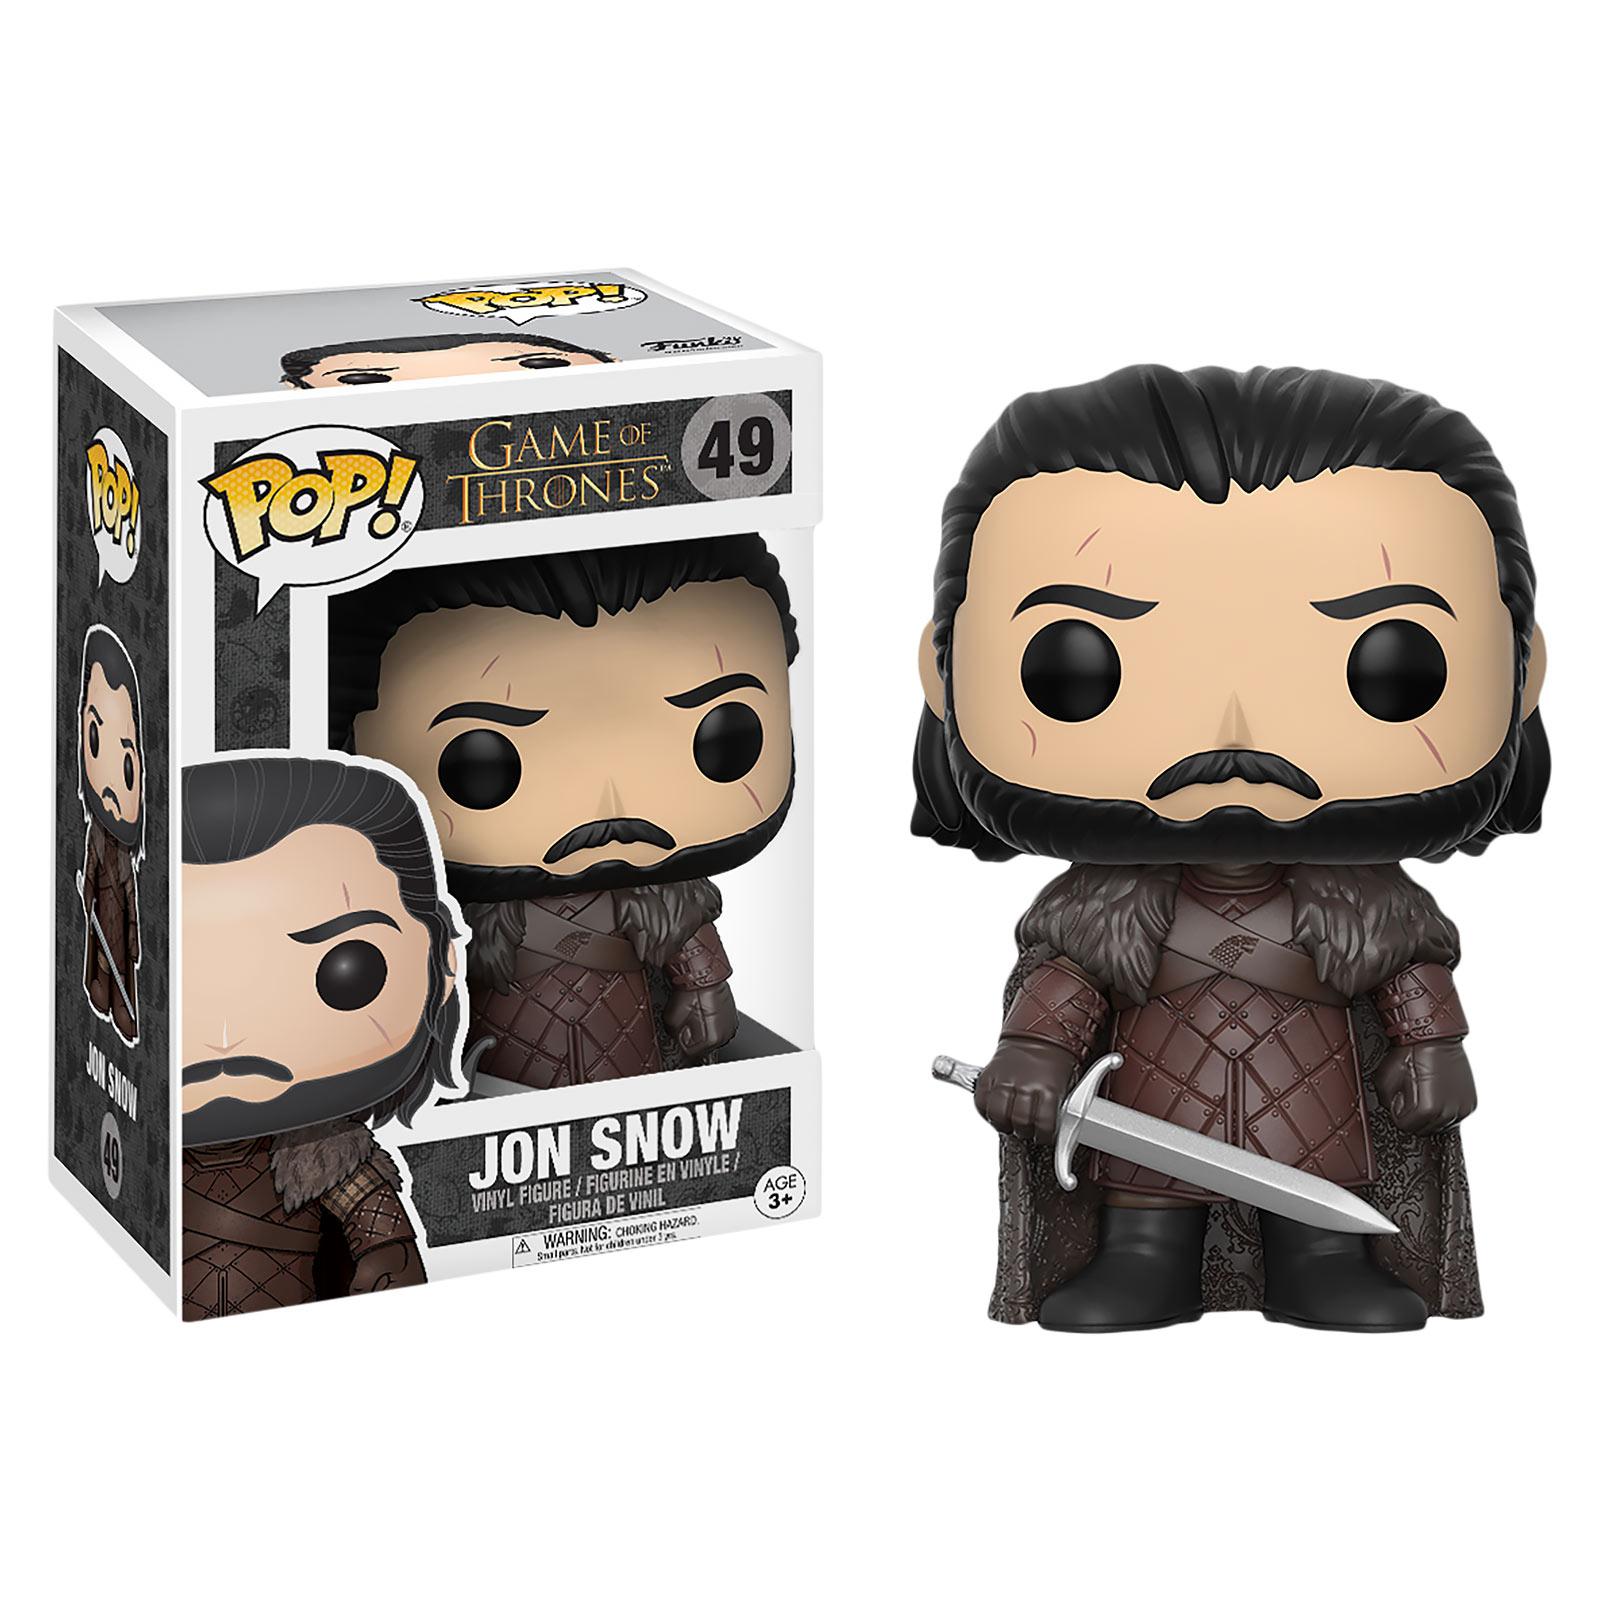 Game of Thrones - Jon Snow Edition 7 Funko Pop Figur